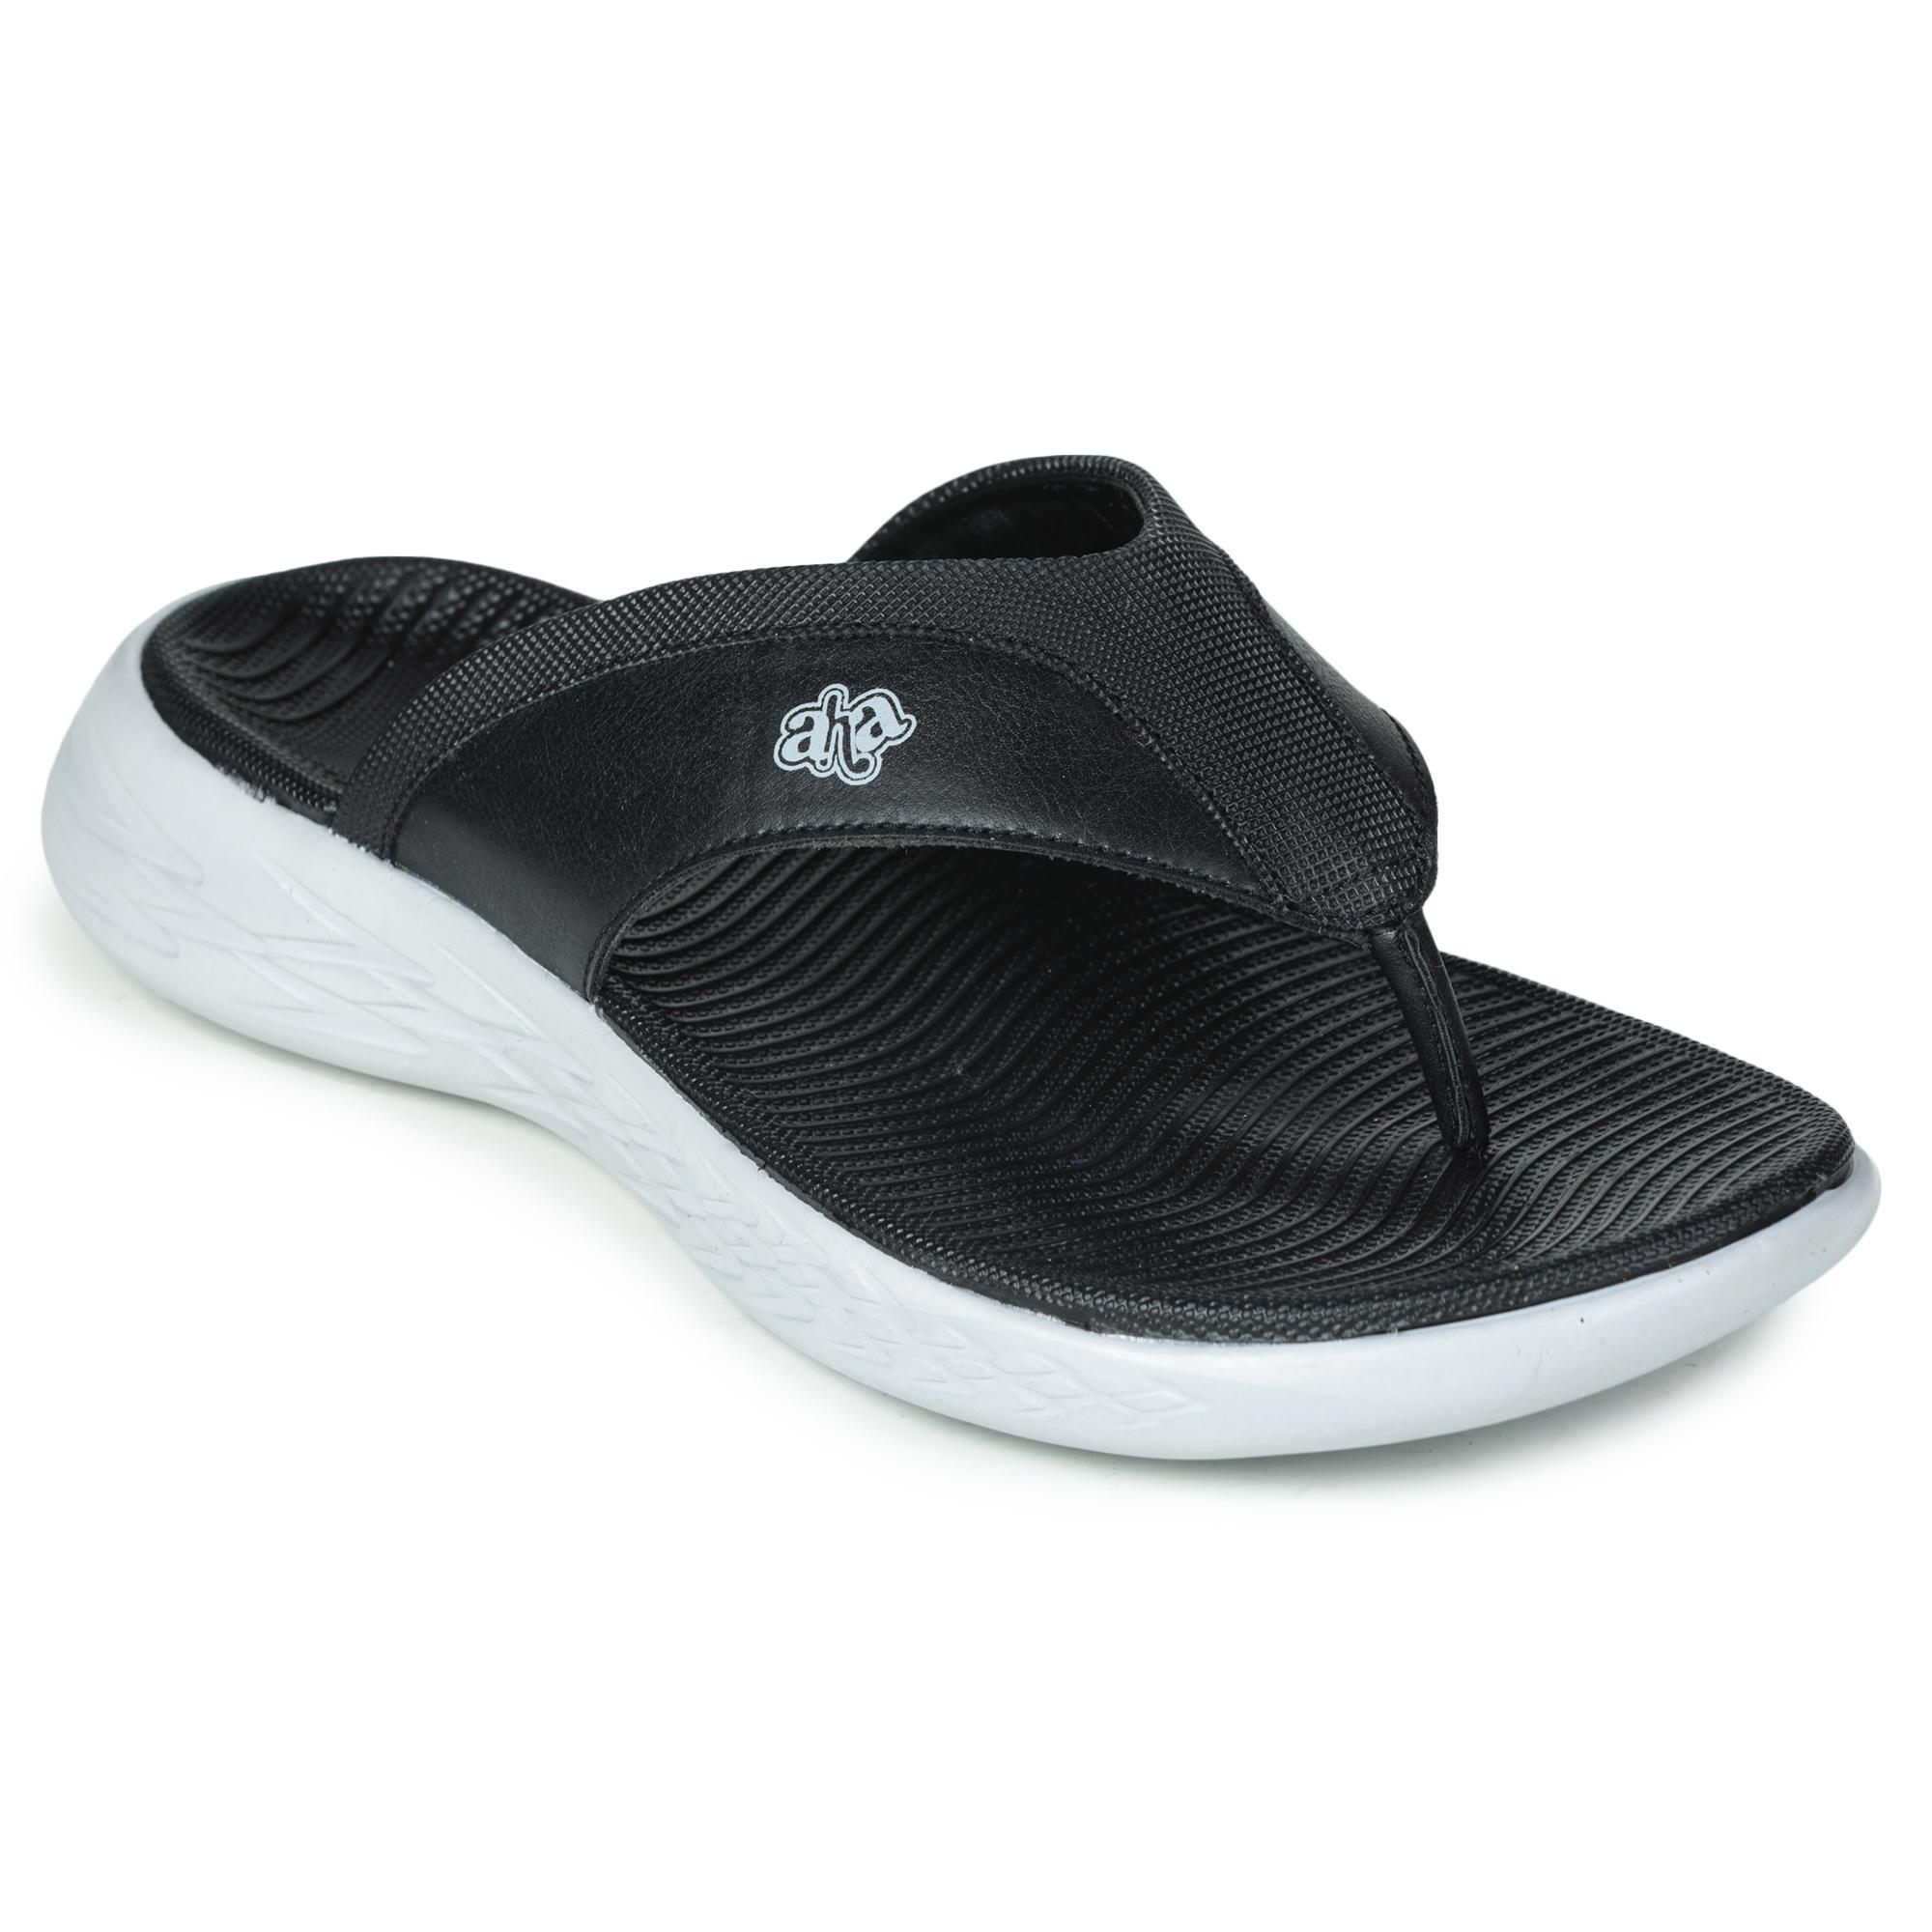 Liberty | Liberty A-HA Slippers IMPACT-6_BLACK For - Men